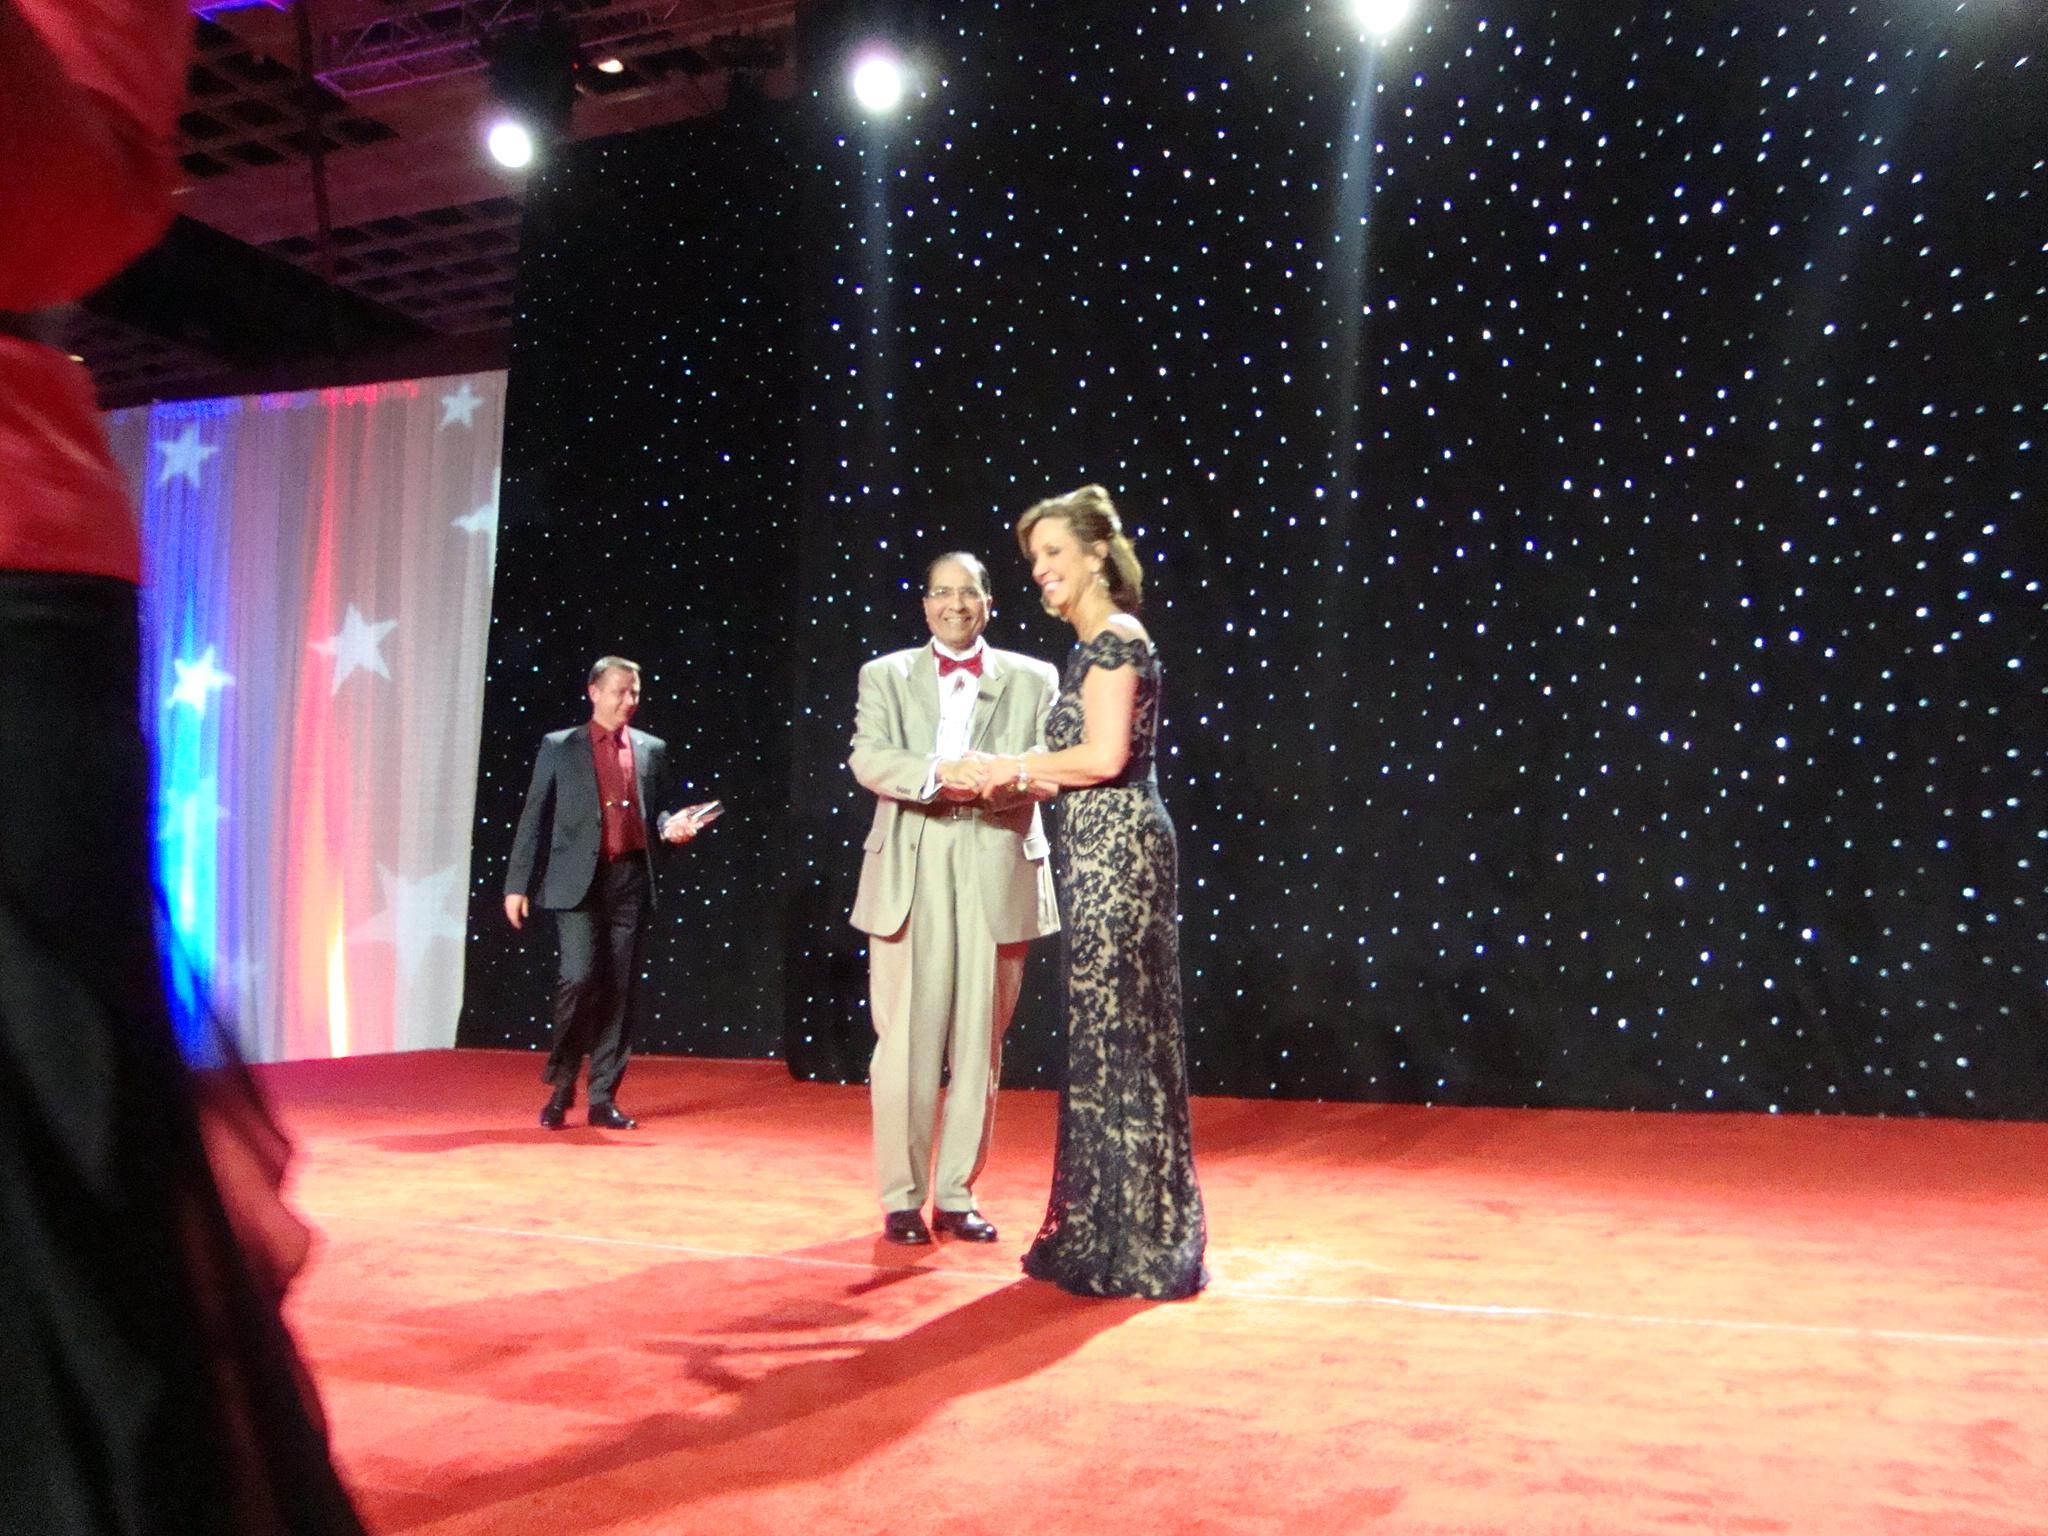 Flavio awards 2 (1).jpg